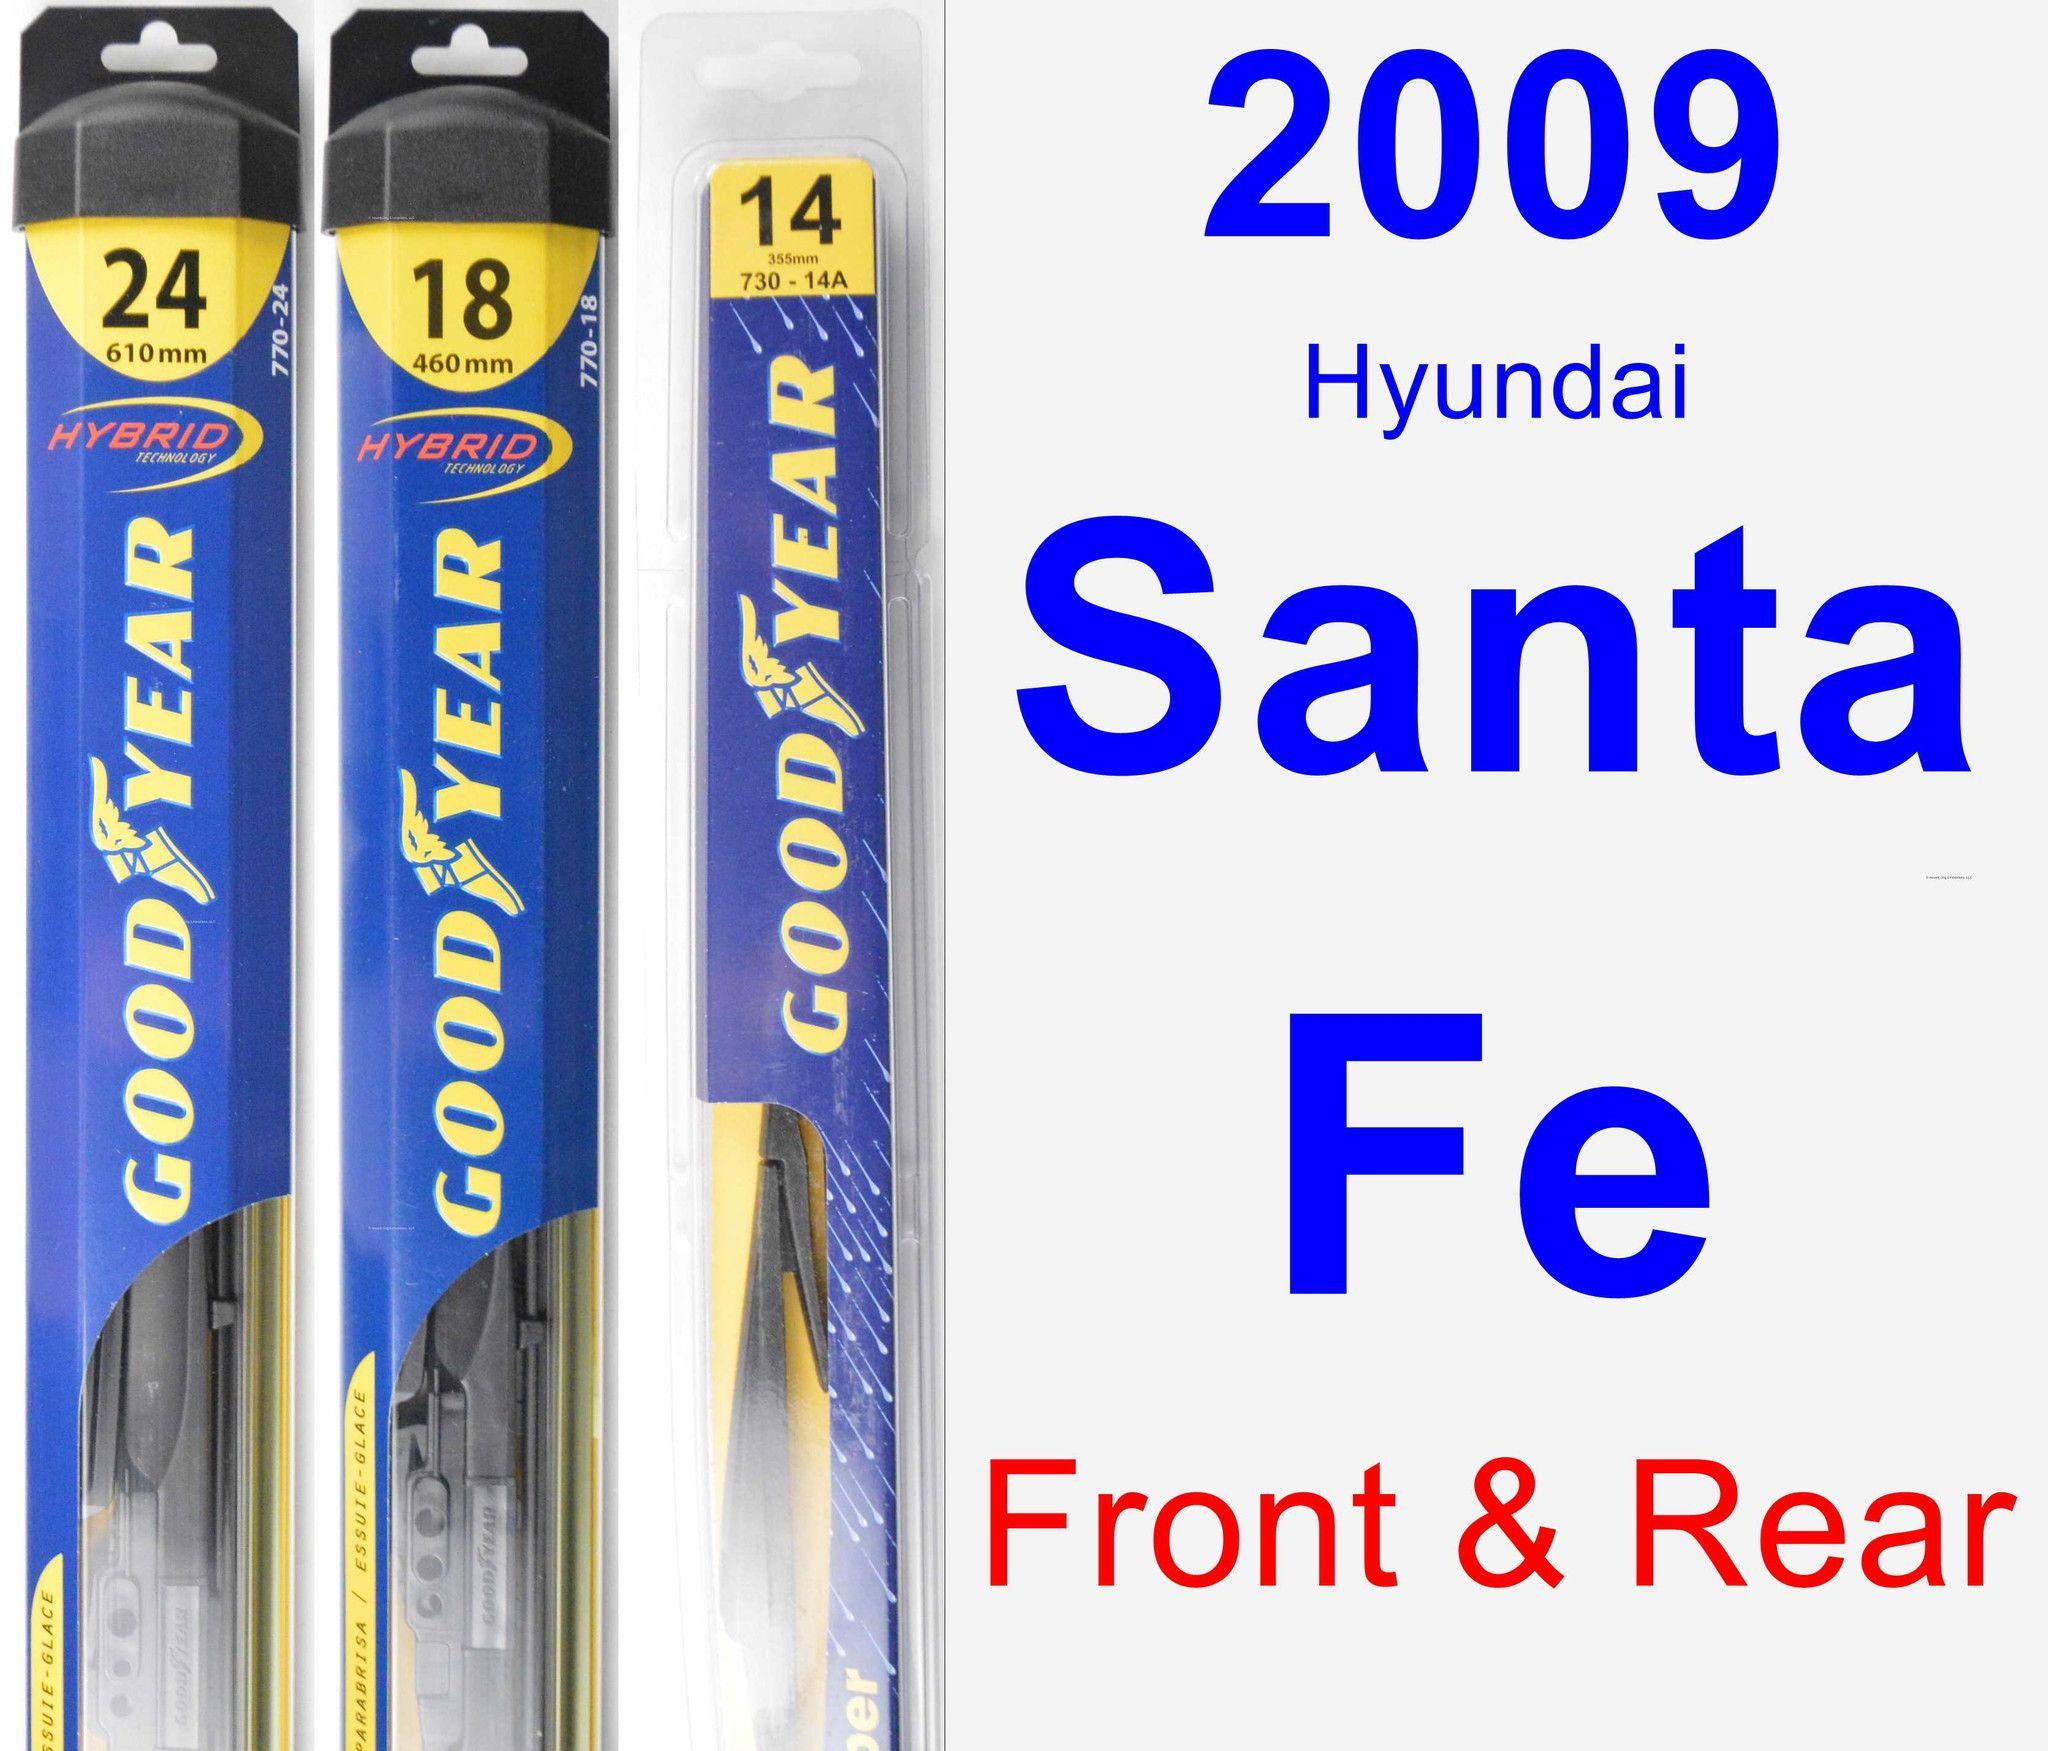 Front & Rear Wiper Blade Pack For 2009 Hyundai Santa Fe